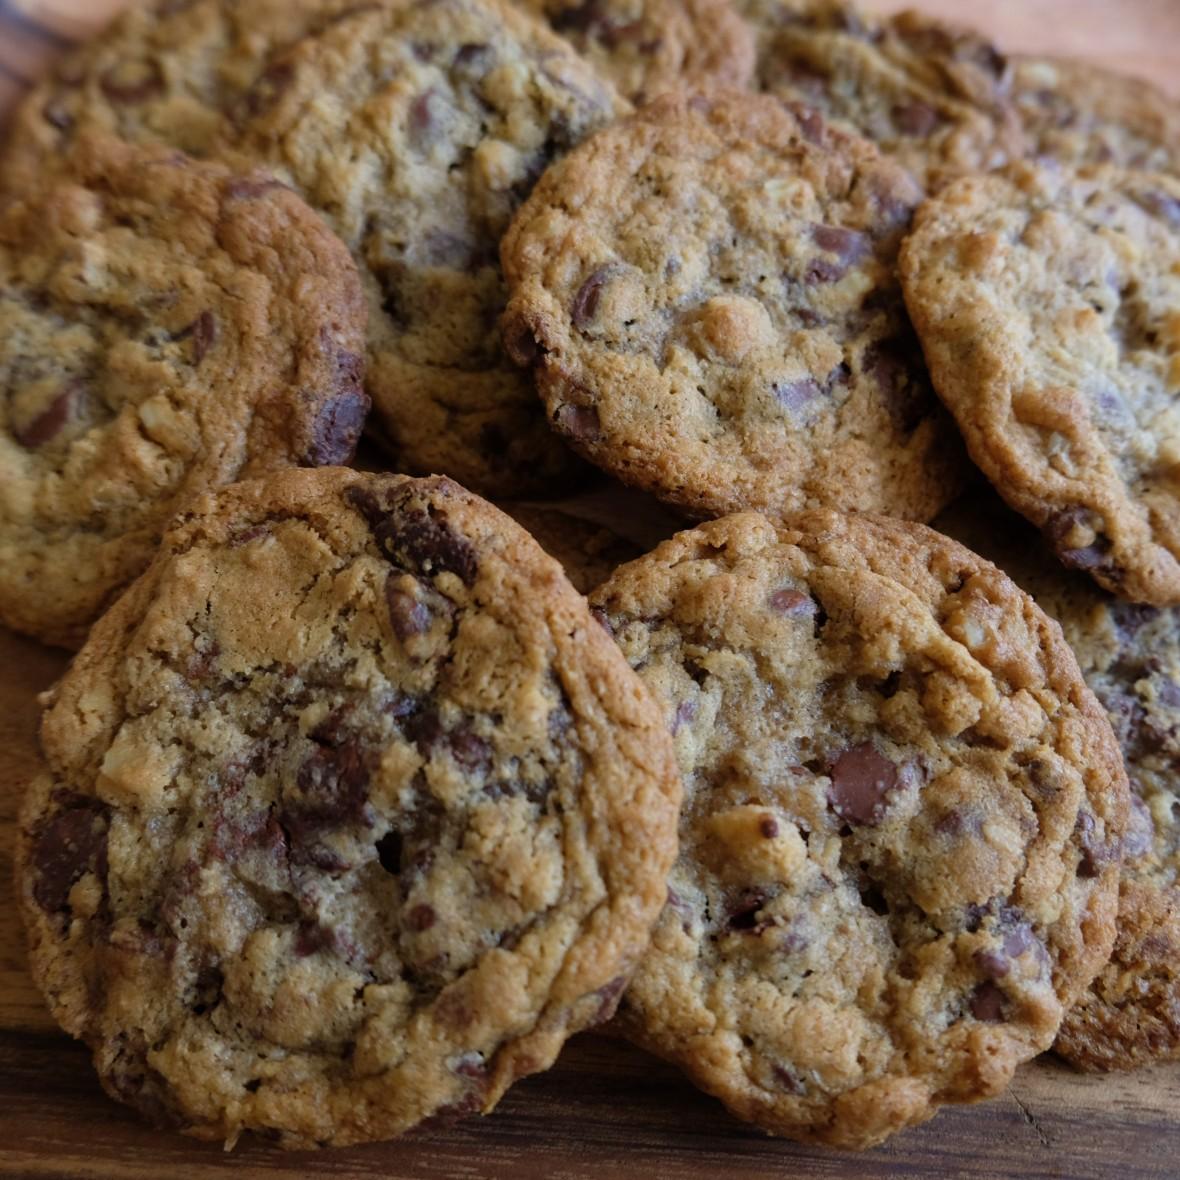 Chocolate chip cookies like Double Tree Hilton cookies